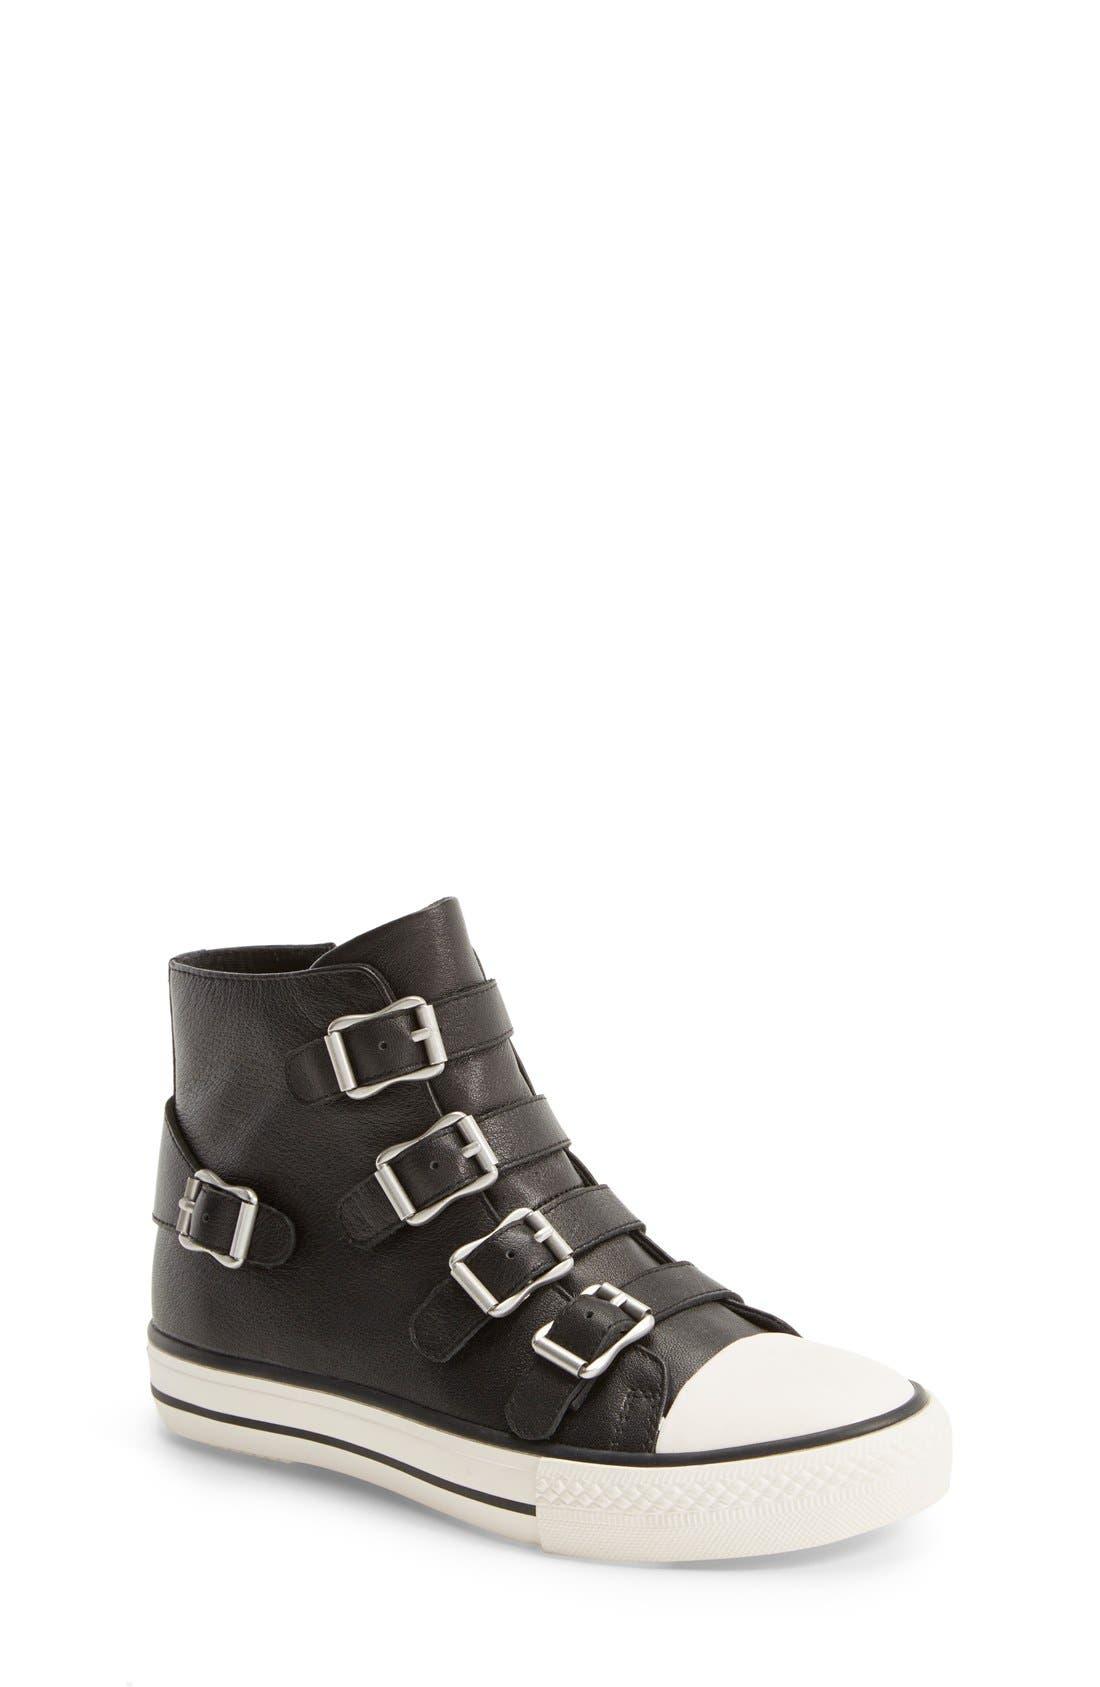 'Vava' Sneaker,                             Main thumbnail 1, color,                             001